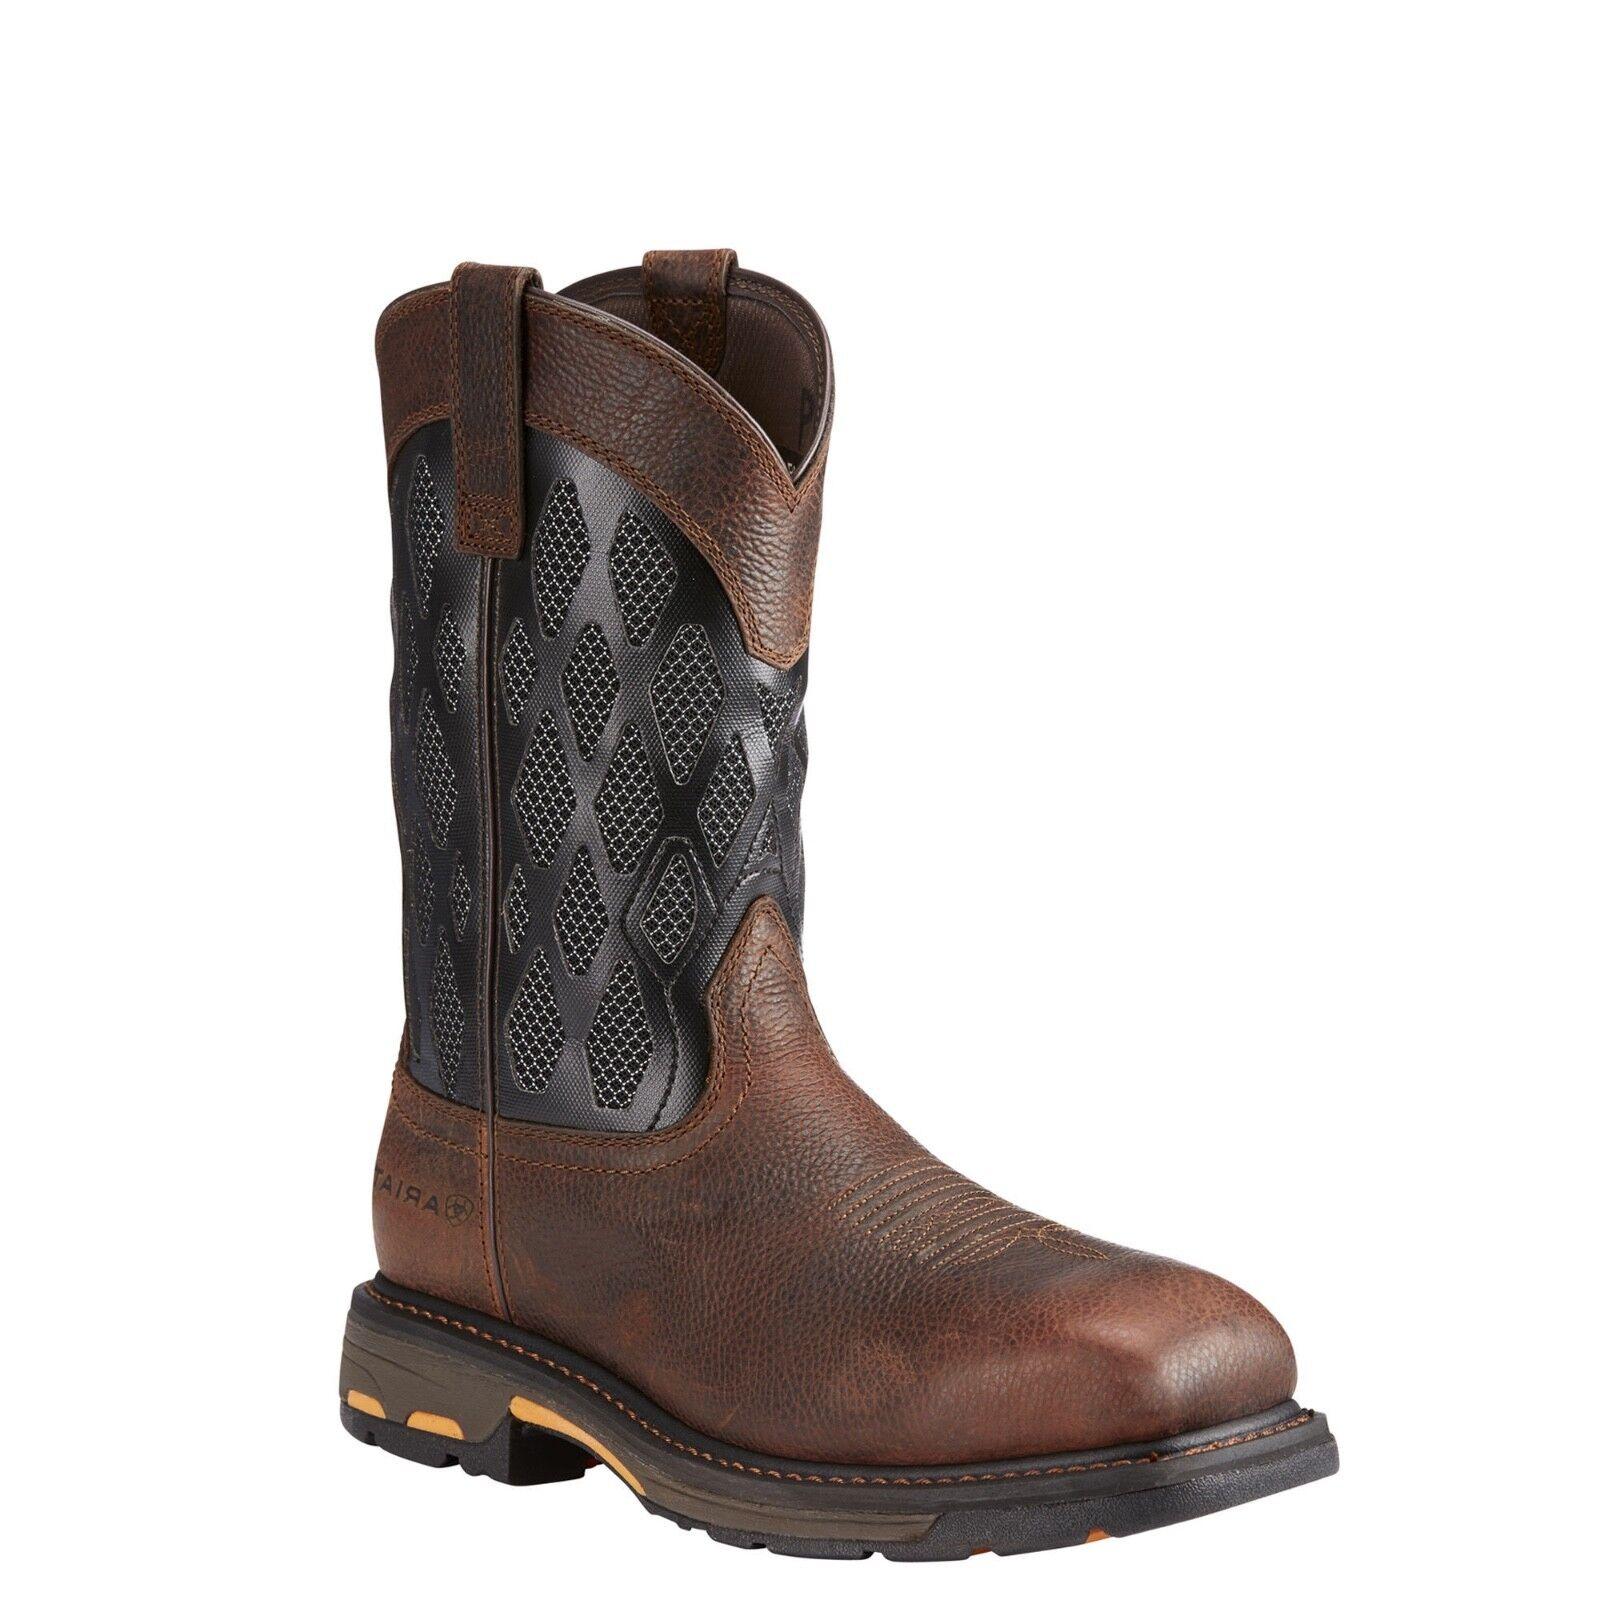 19770451e5d Ariat® Men's Workhog VentTek Matrix Brown & Black Work Boots 10023094